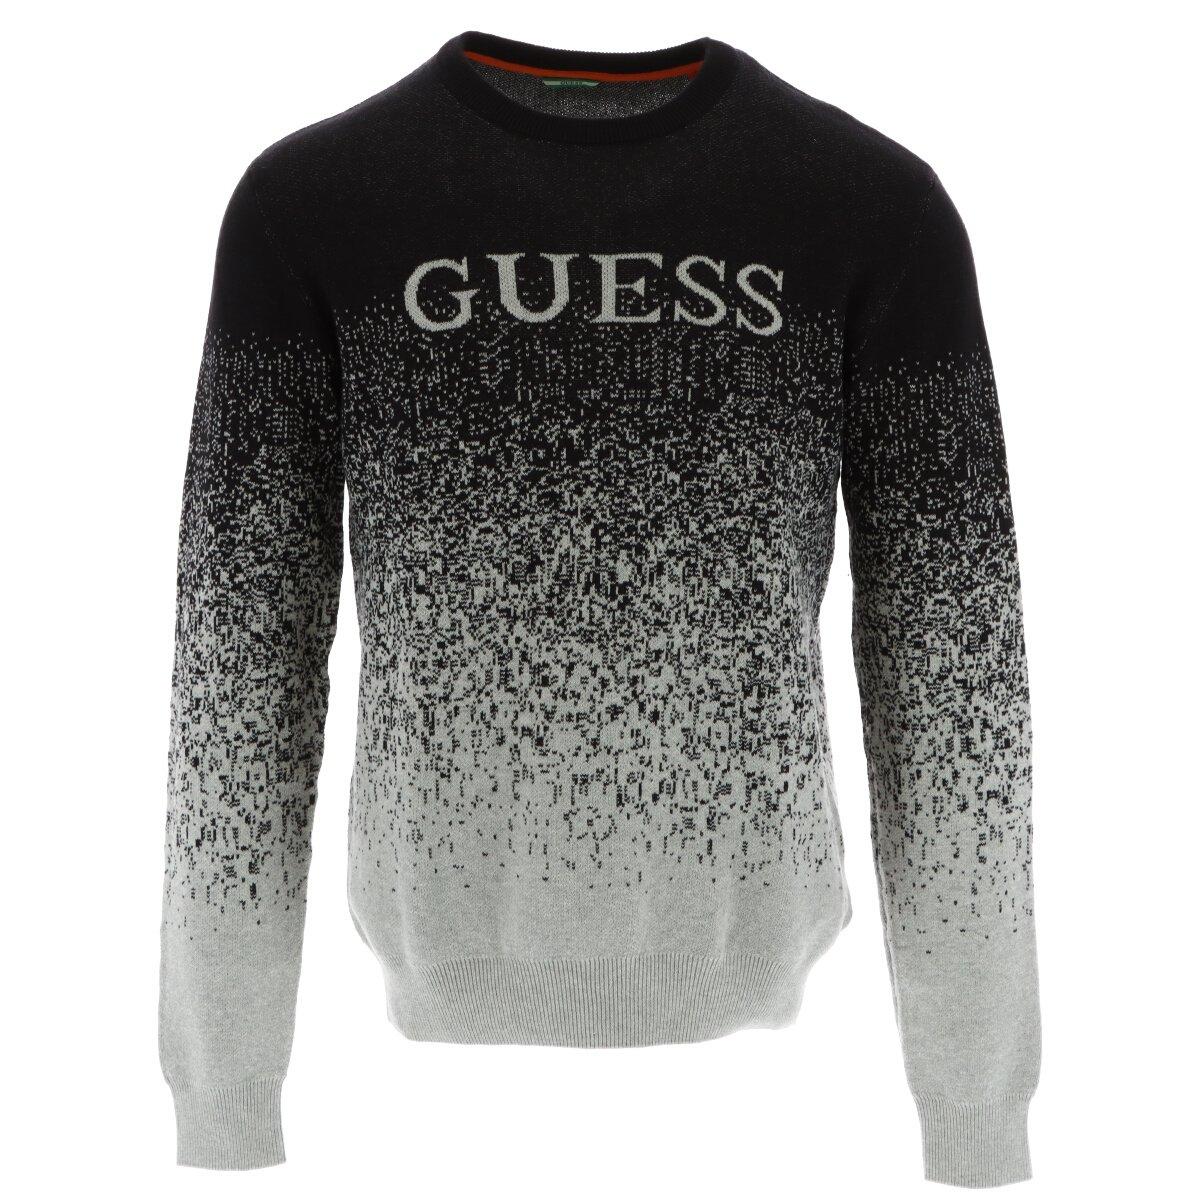 Guess Men's Sweater Various Colours 307417 - black XS